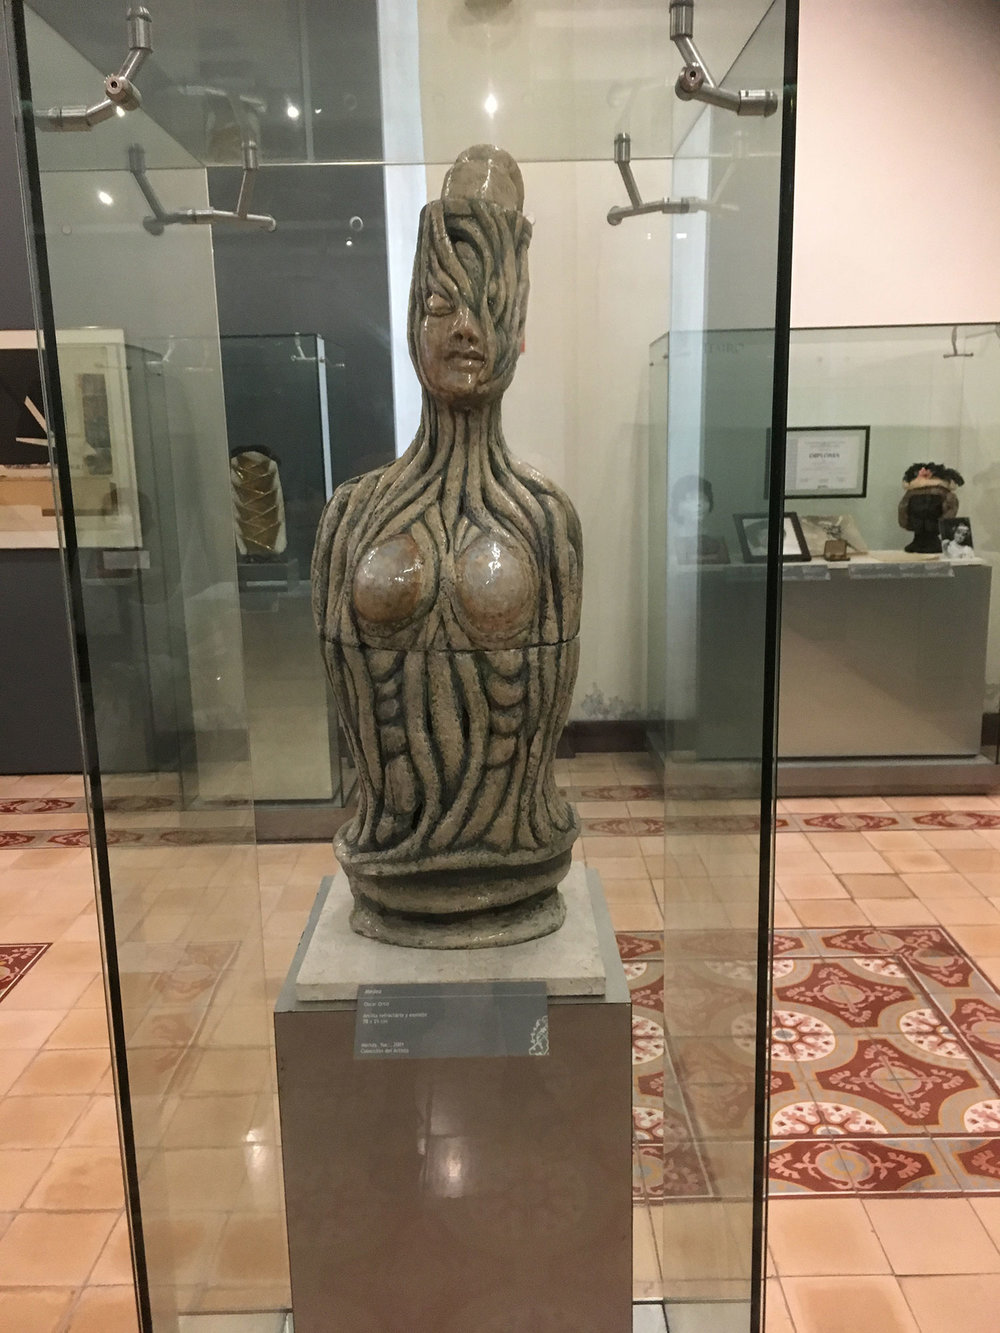 Hammocks_and_Ruins_Blog_Riviera_Maya_Mexico_Travel_Discover_Yucatan_What_to_do_Museums_Merida_City_Museum_32.jpg